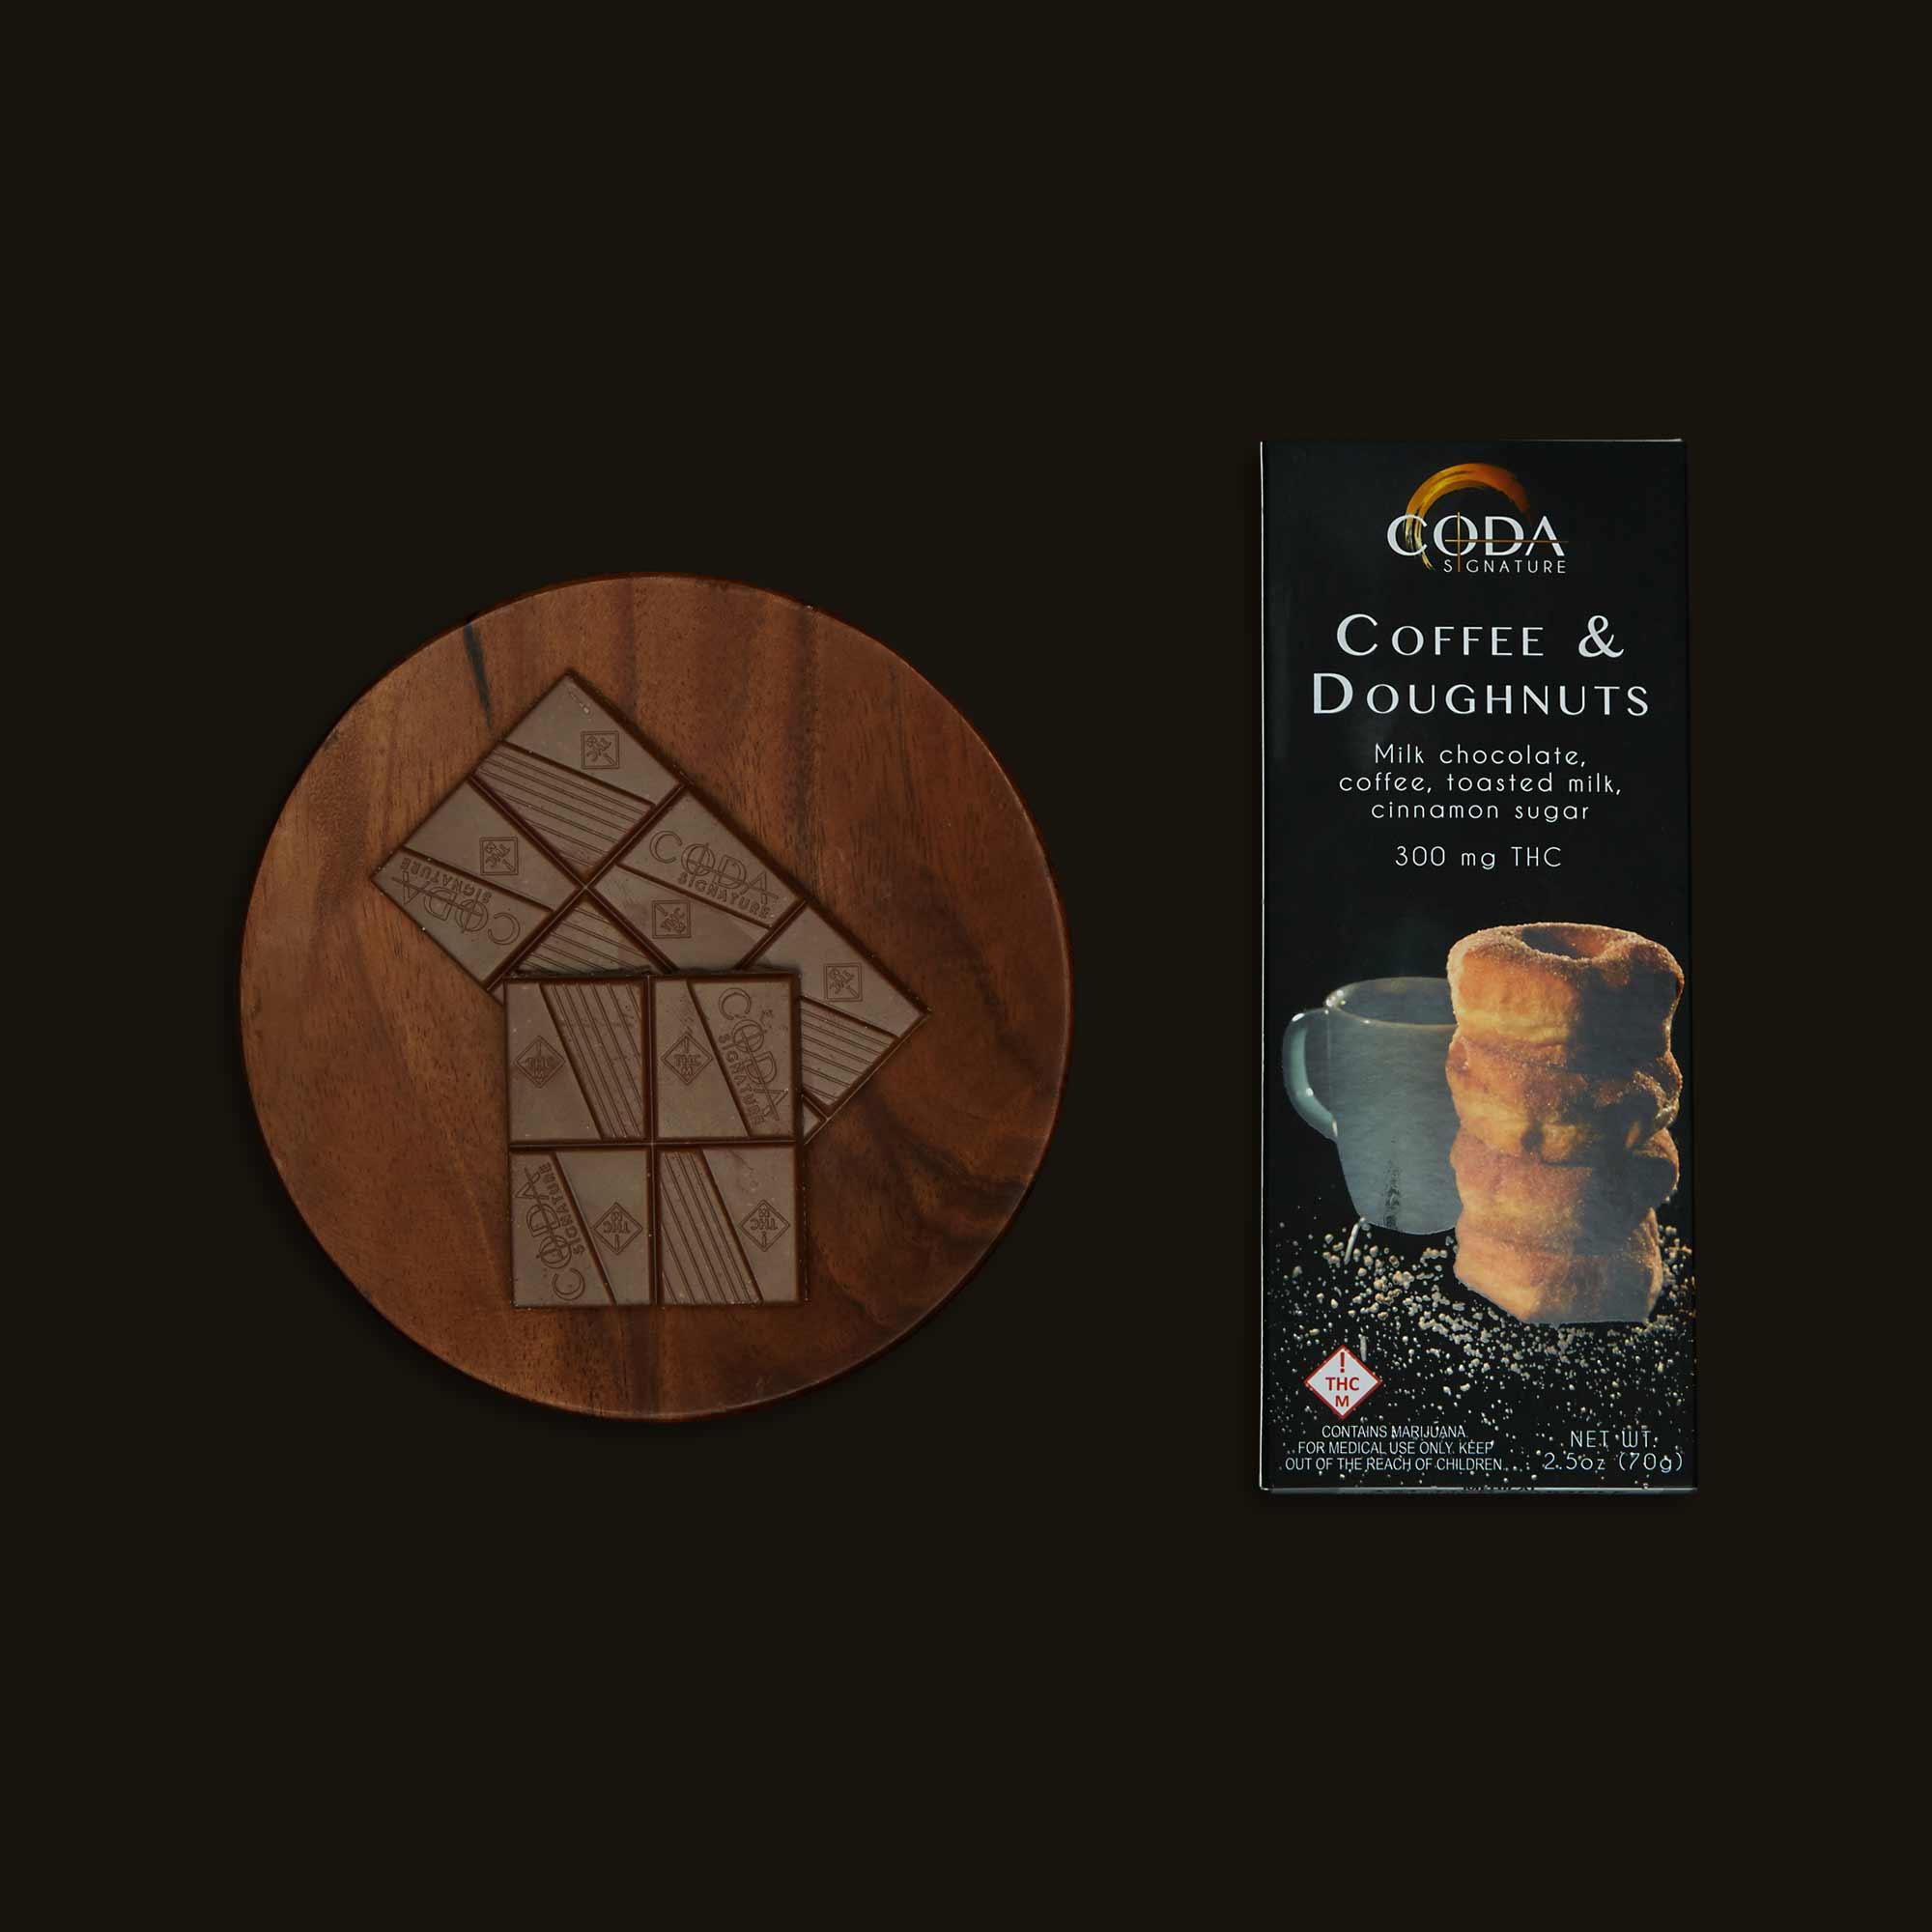 Coda Signature Coffee & Doughnuts: Extra Strength